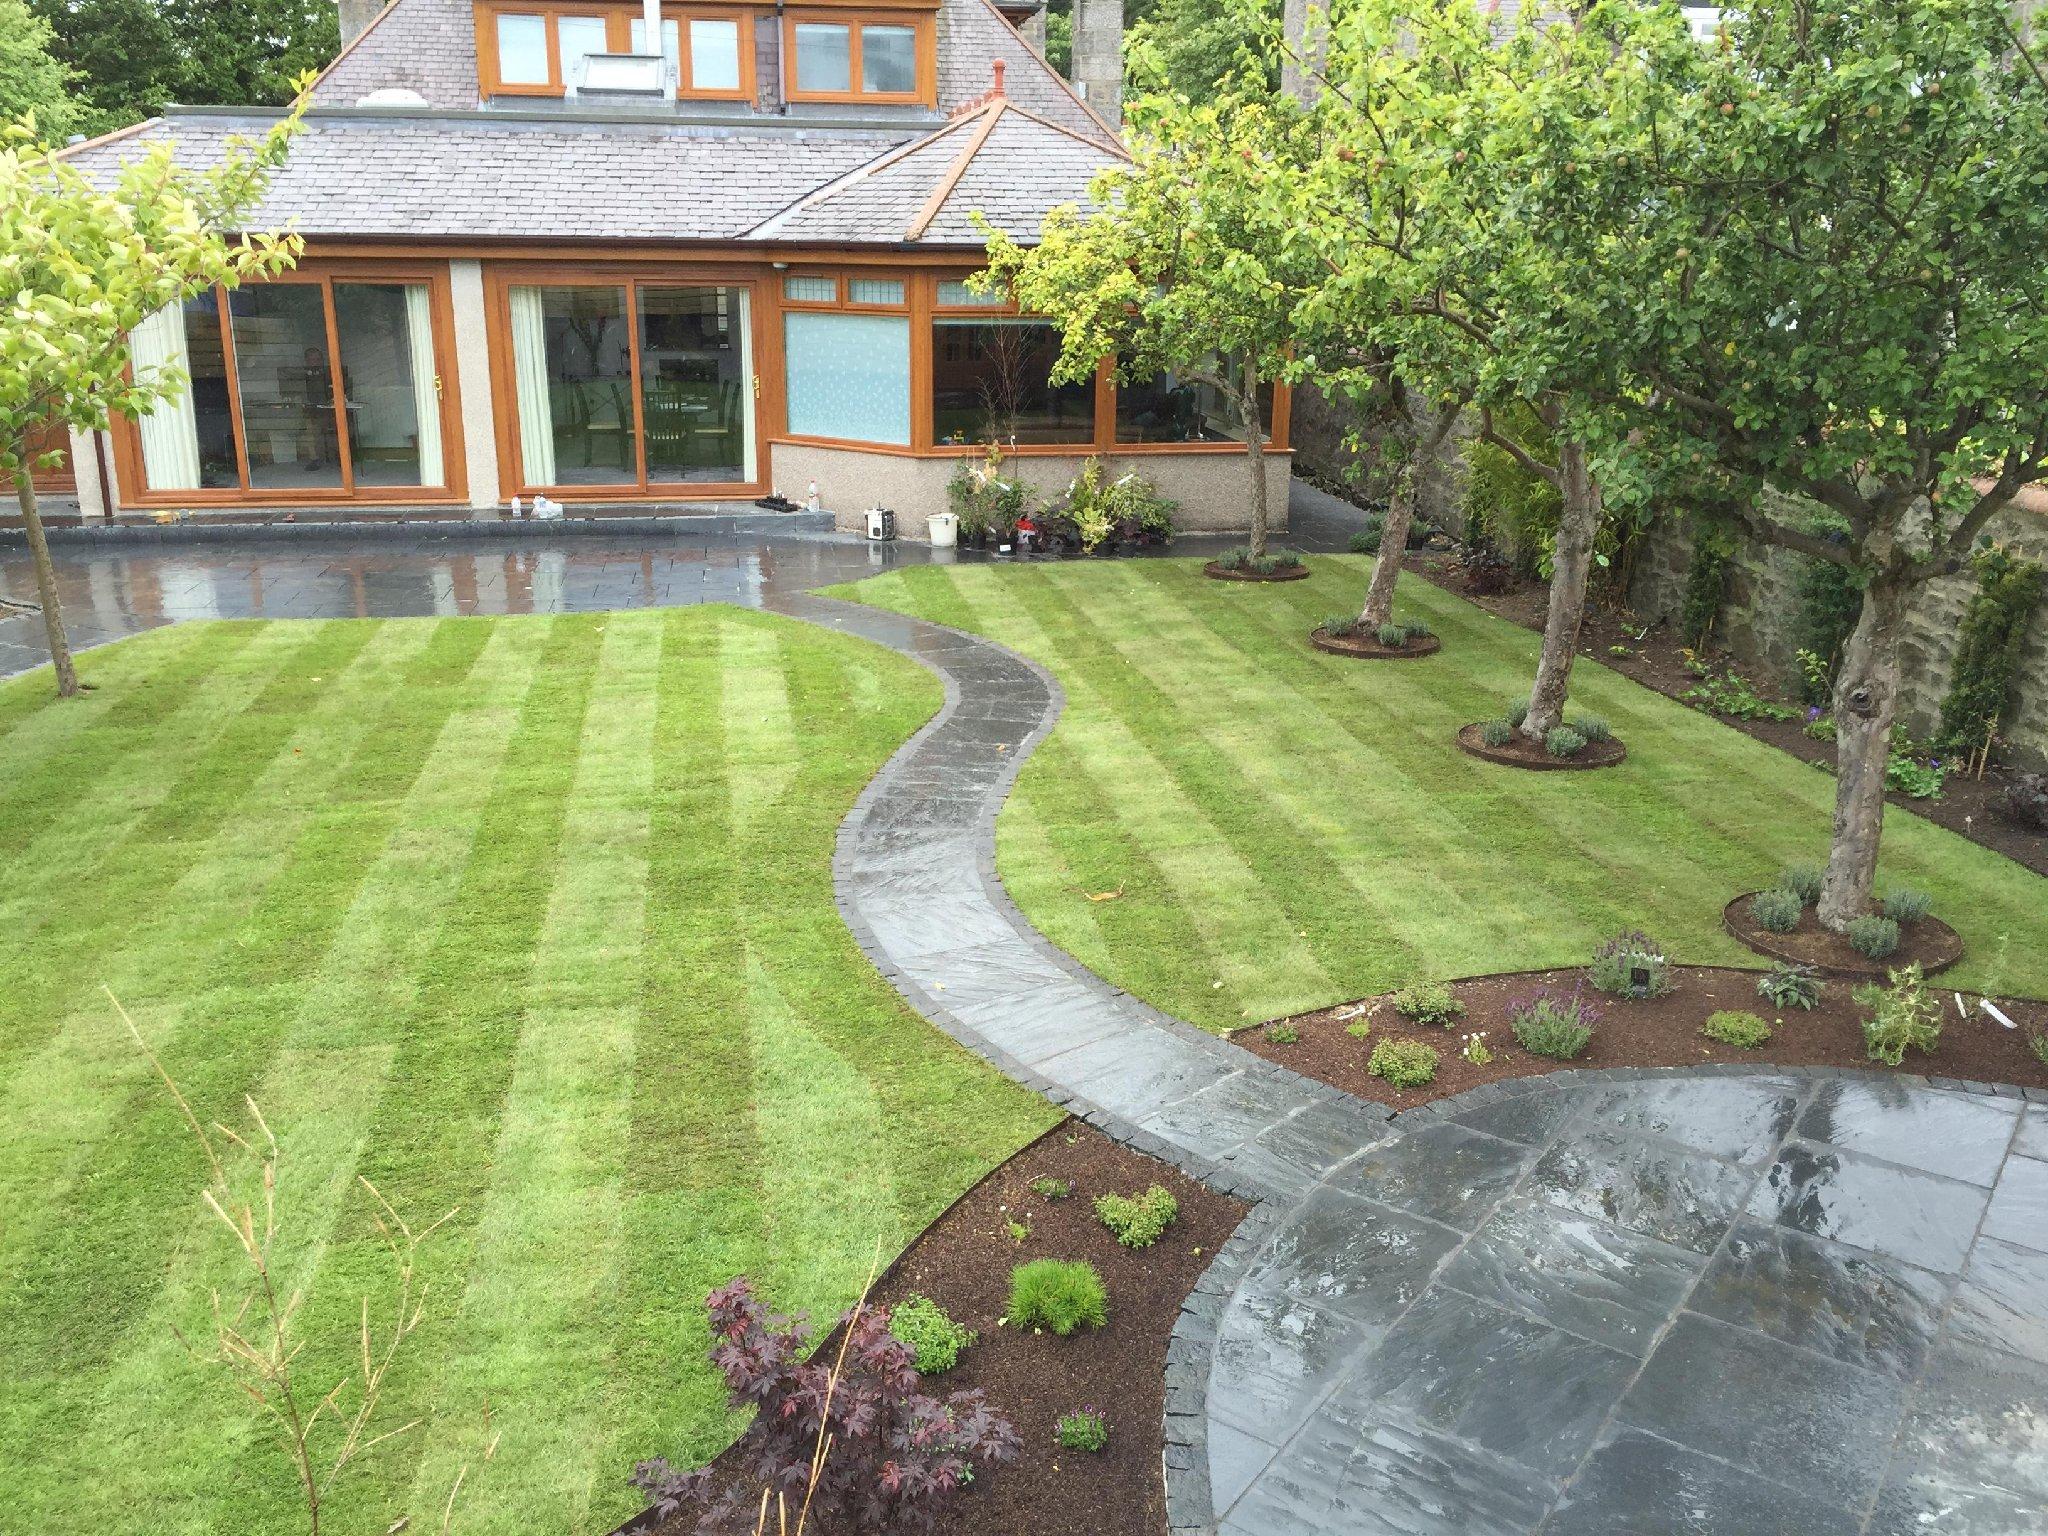 Life Landscaping Ltd - Landscape Contractors In Aberdeen AB21 0SE - 192.com